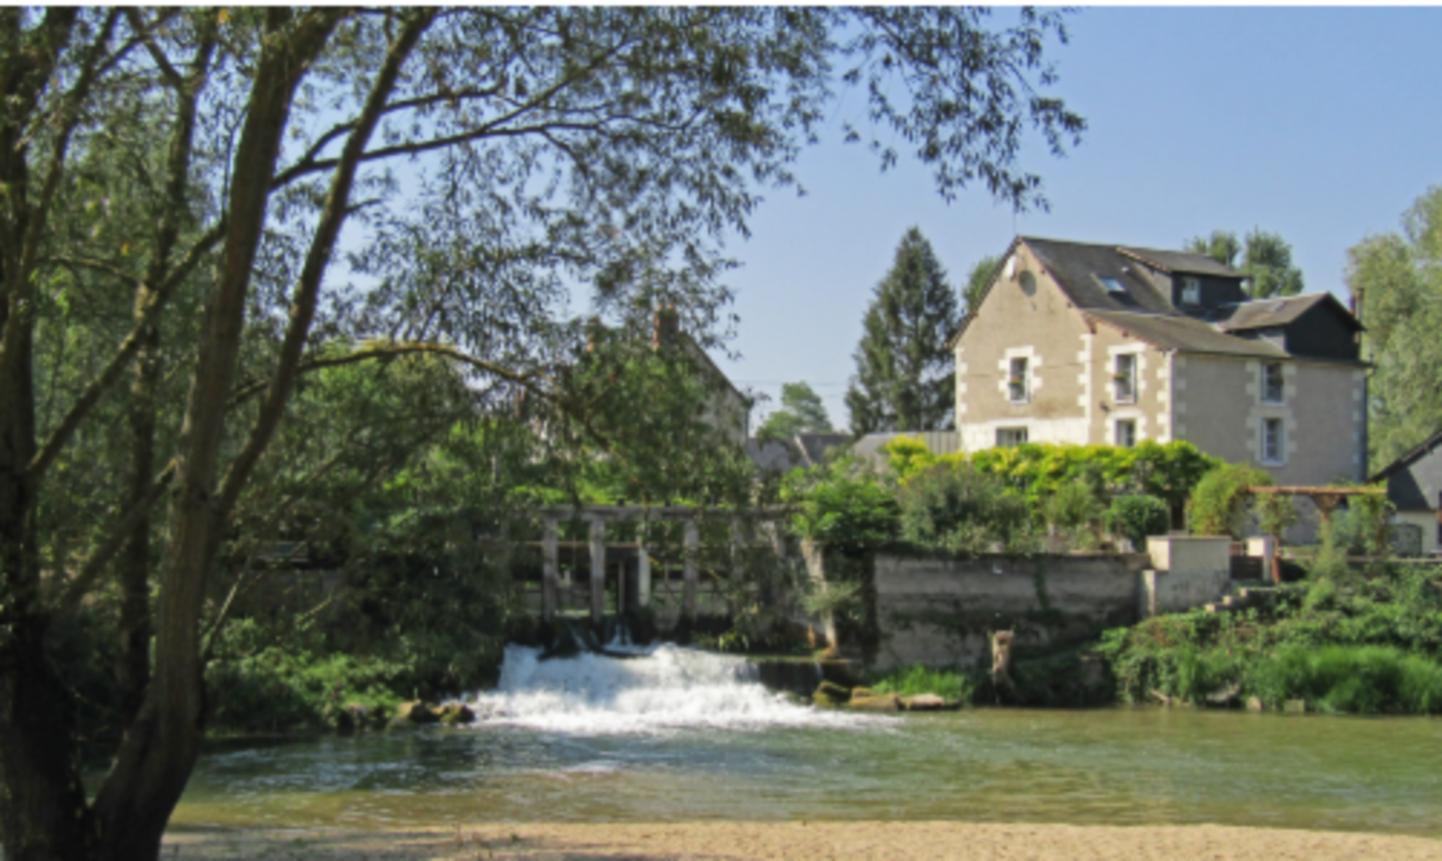 A bridge over a body of water at Le Moulin de Saint Jean.